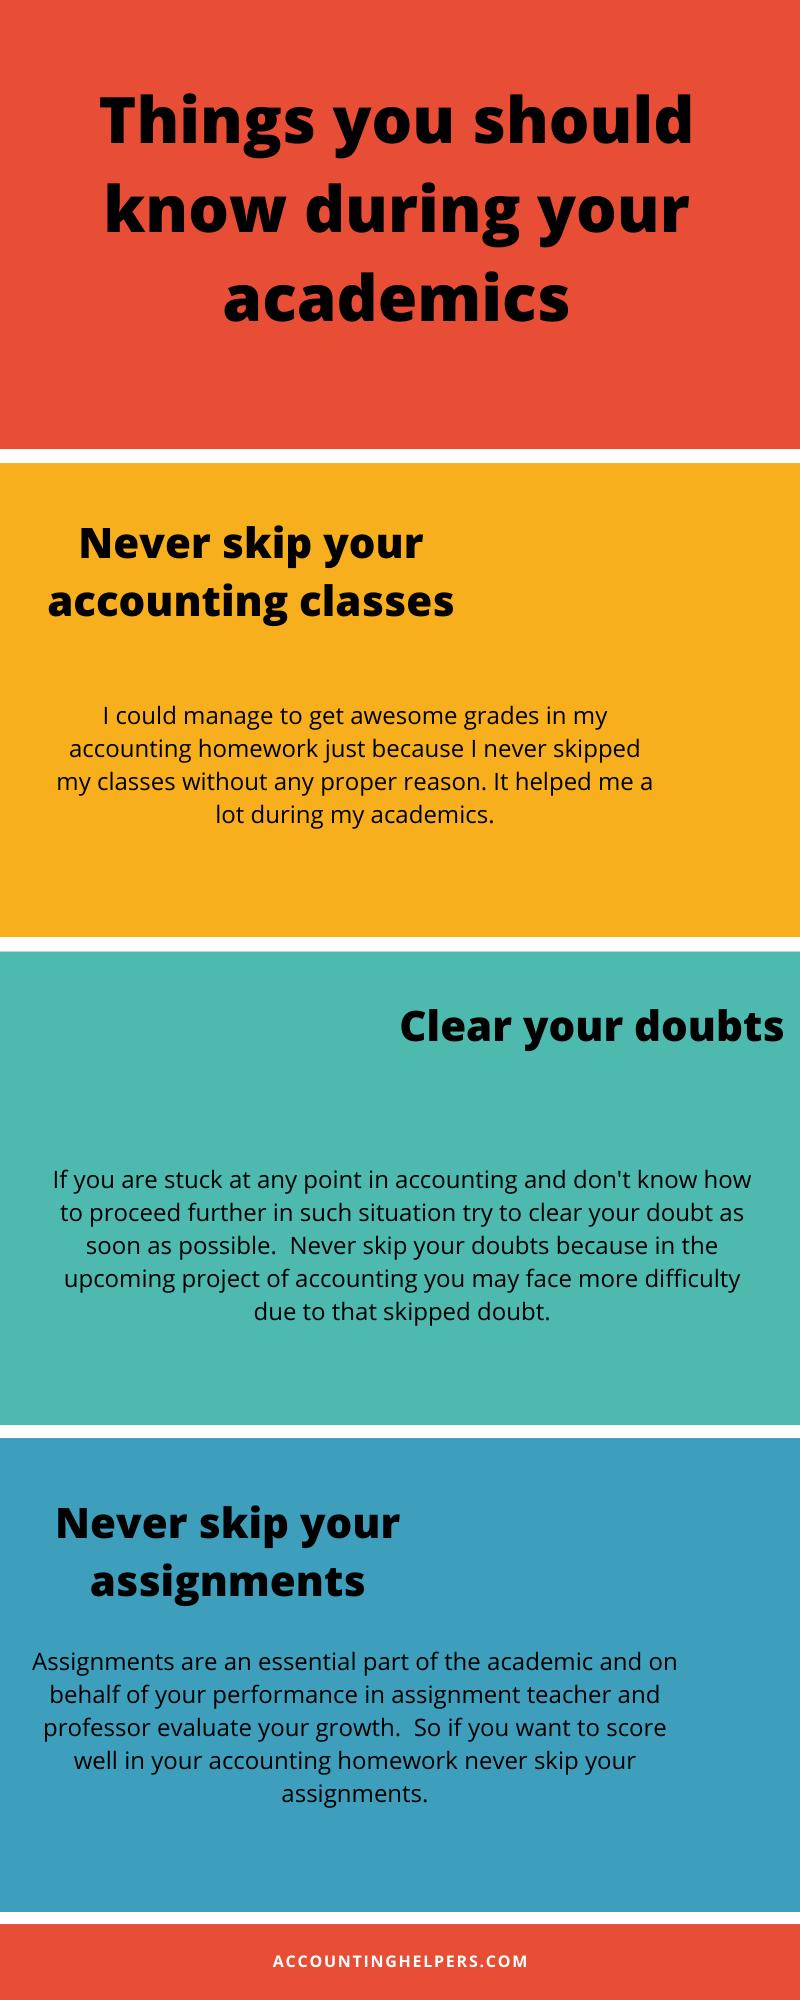 How-I-scored-top-grade-in-accounting-homework